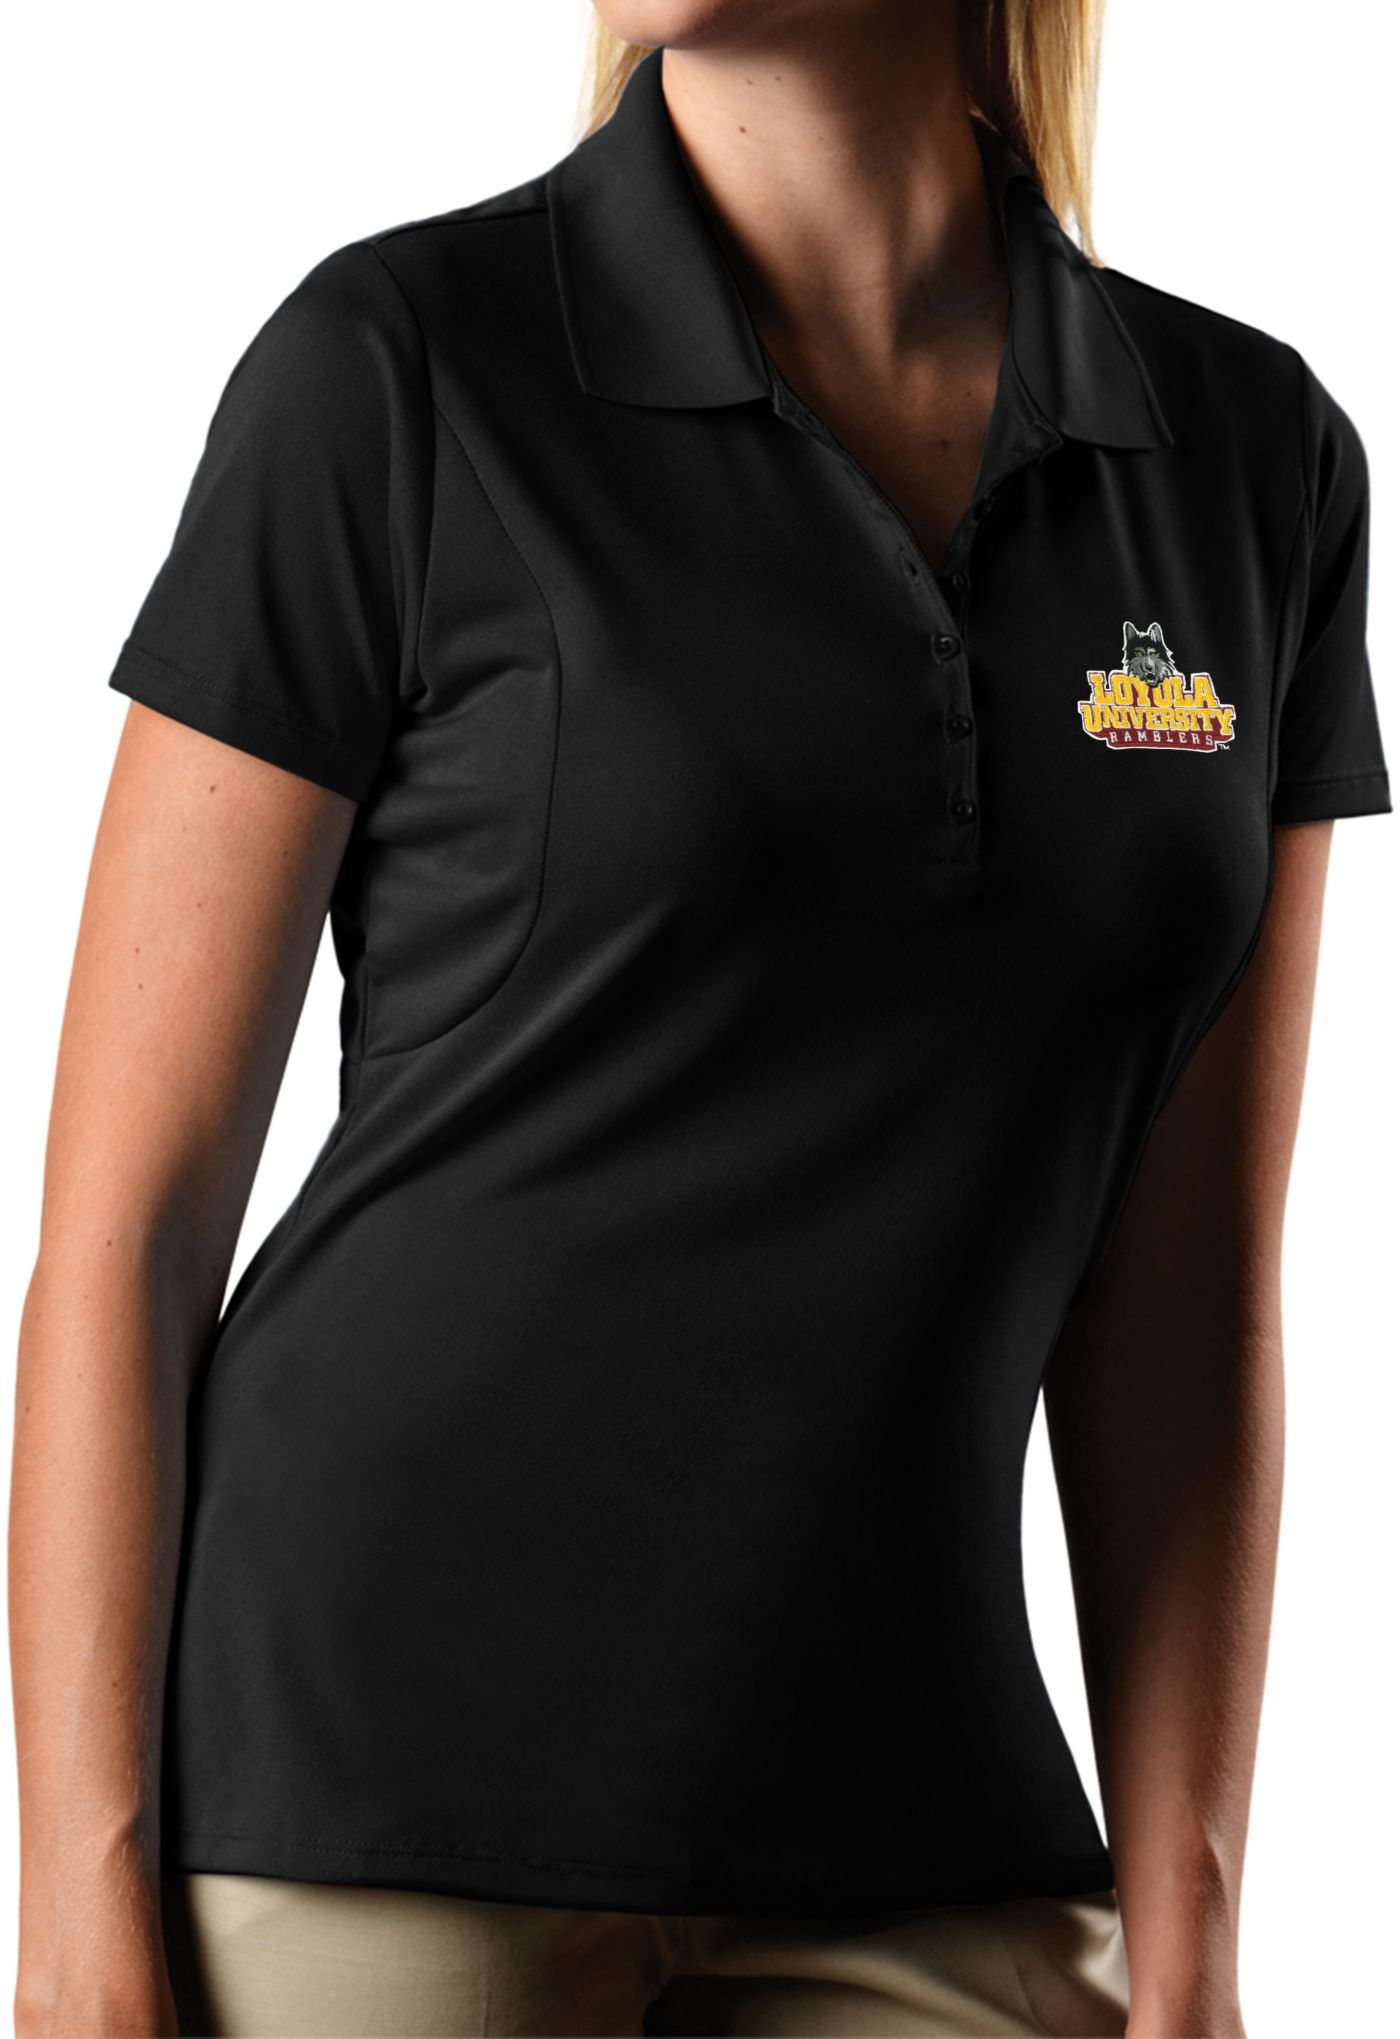 Antigua Women's Loyola Chicago Ramblers Pique X-tra Lite Black Polo